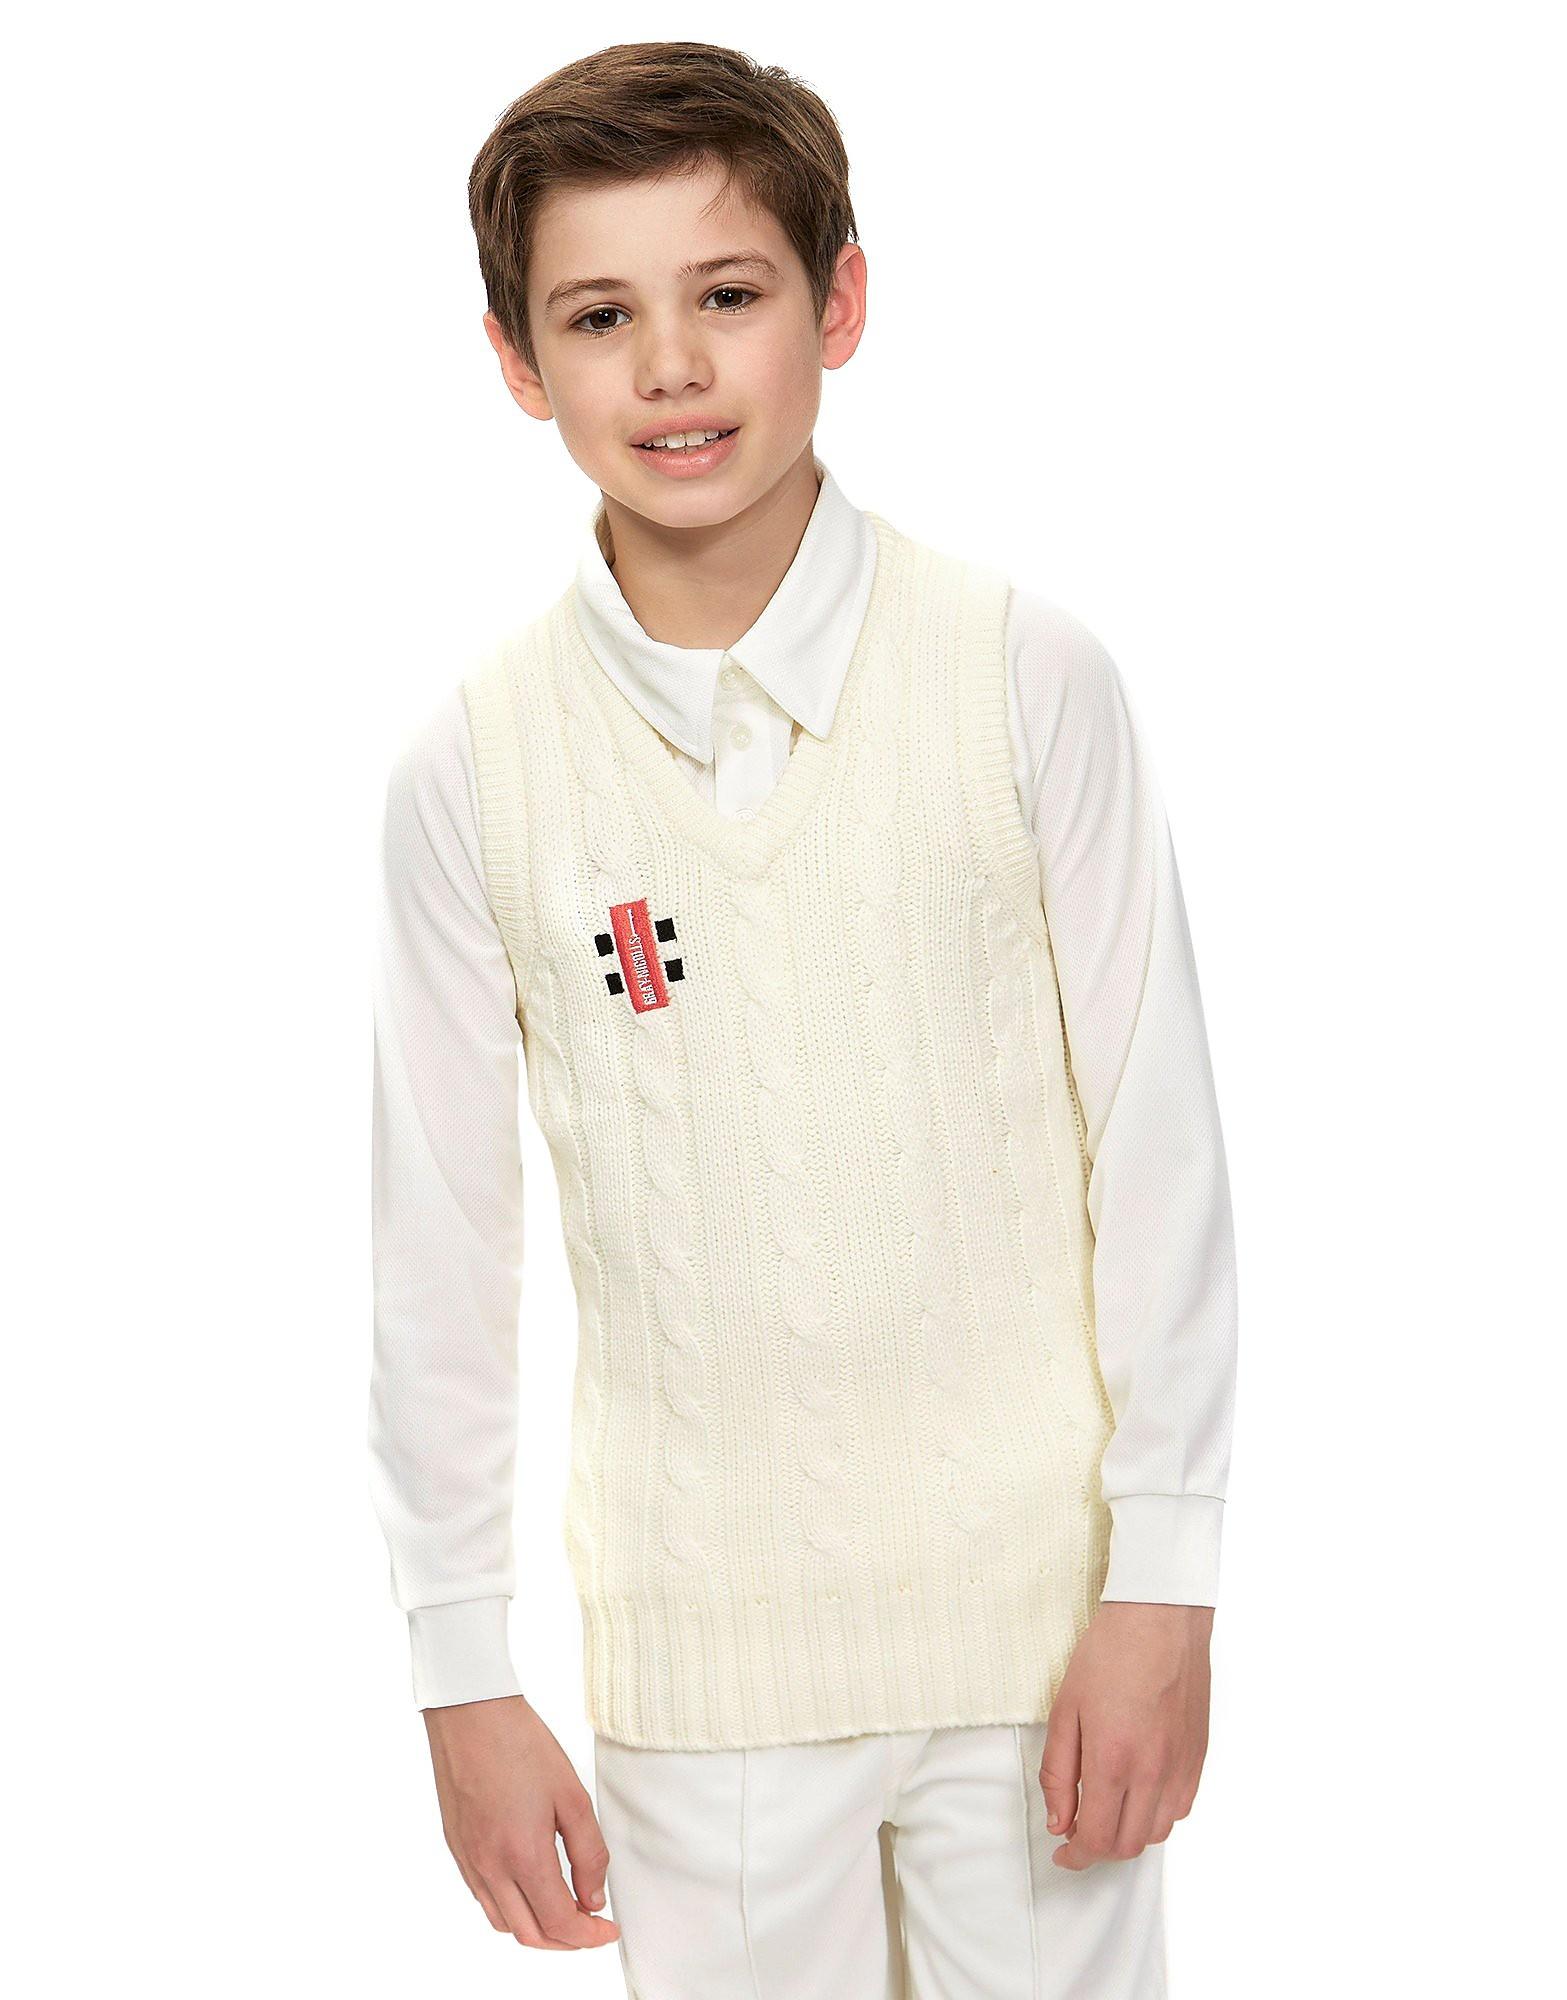 Gray Nicolls Knitted Acrylic Junior Sleeveless Cricket Jumper